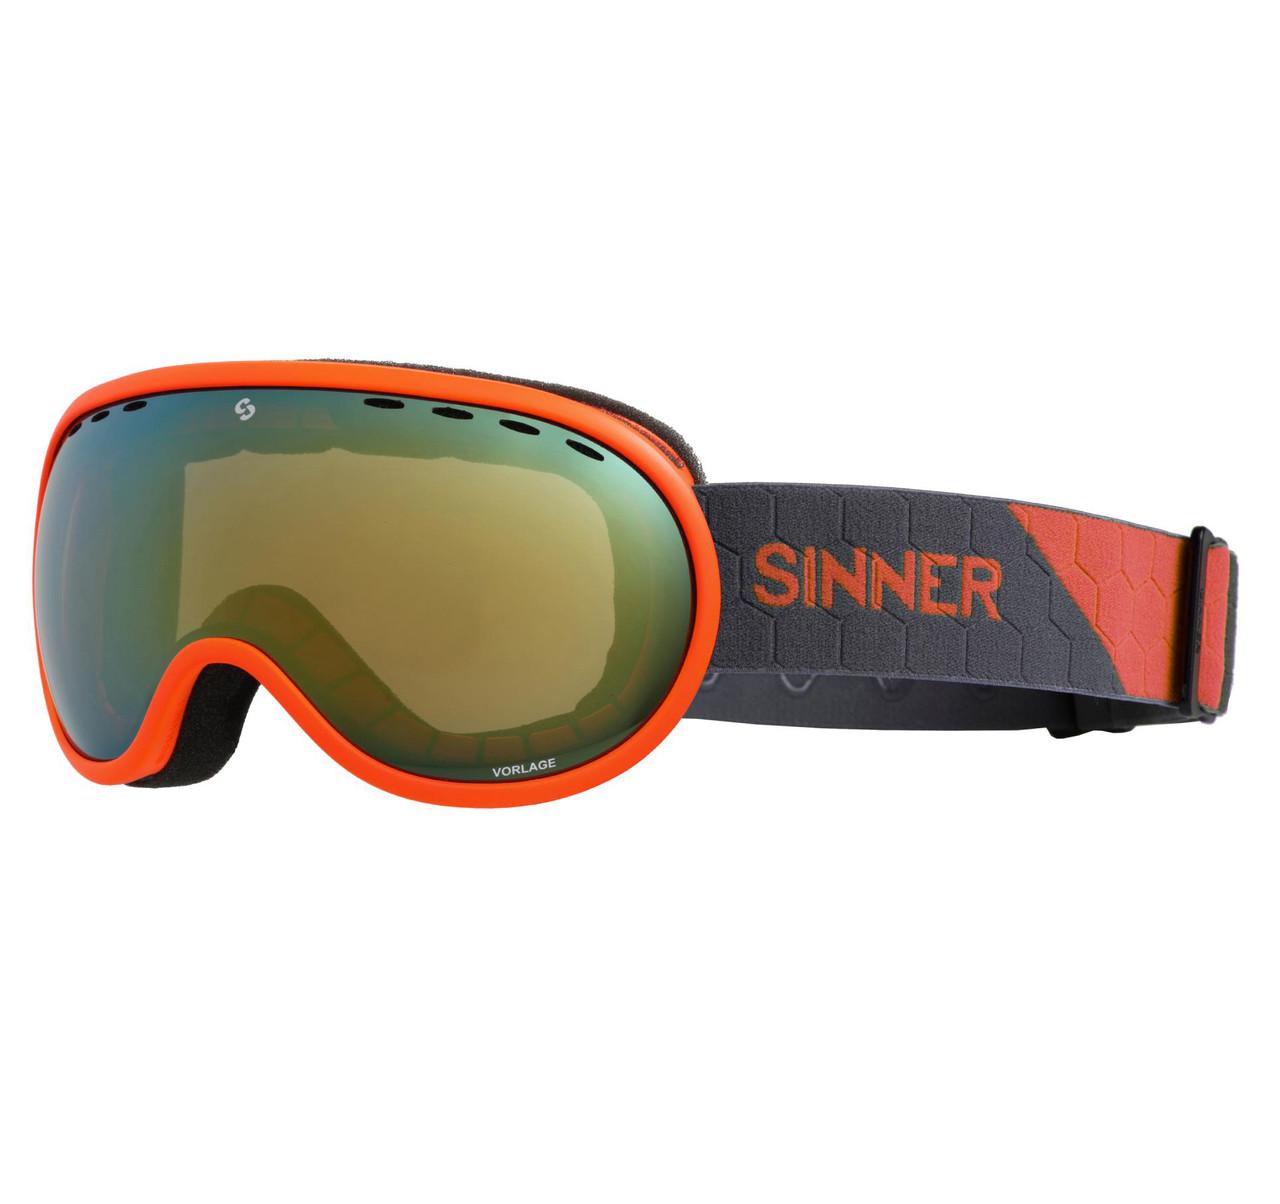 Маска гірськолижна Sinner VORLAGE Matte Orange-Full Orange Mir